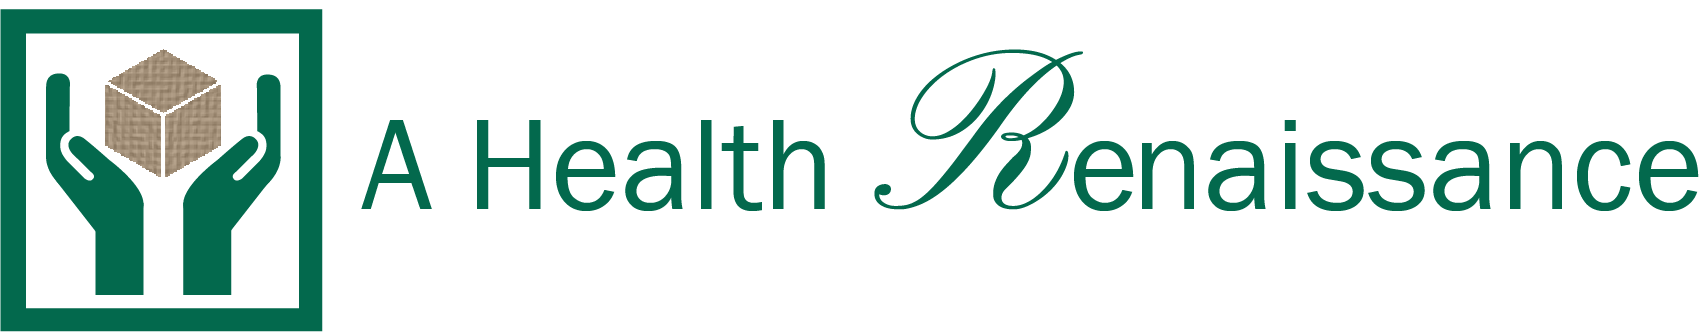 A Health Renaissance